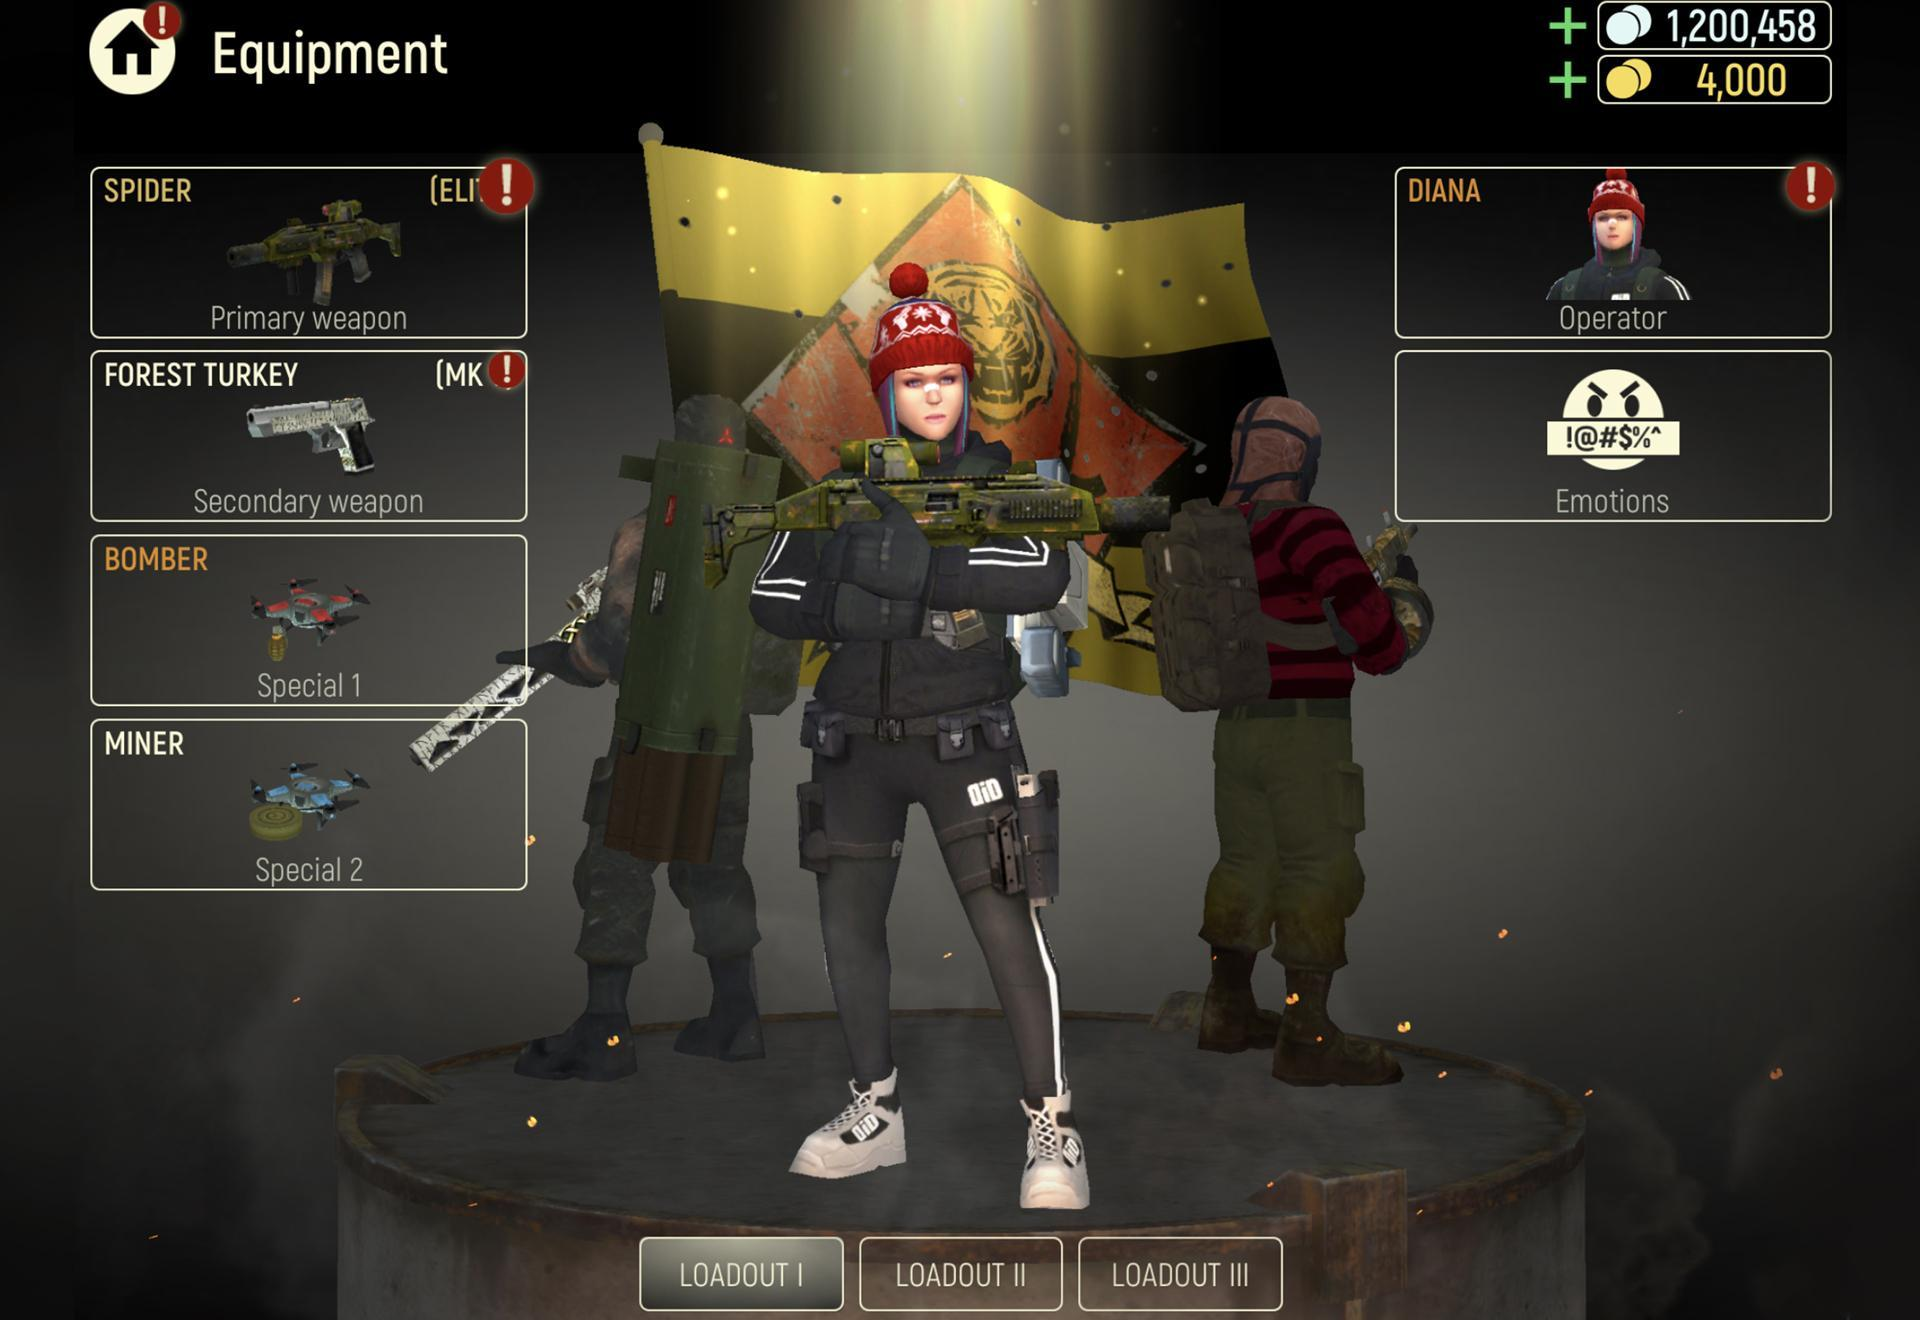 Tacticool 5v5 shooter 1.31.0 Screenshot 3